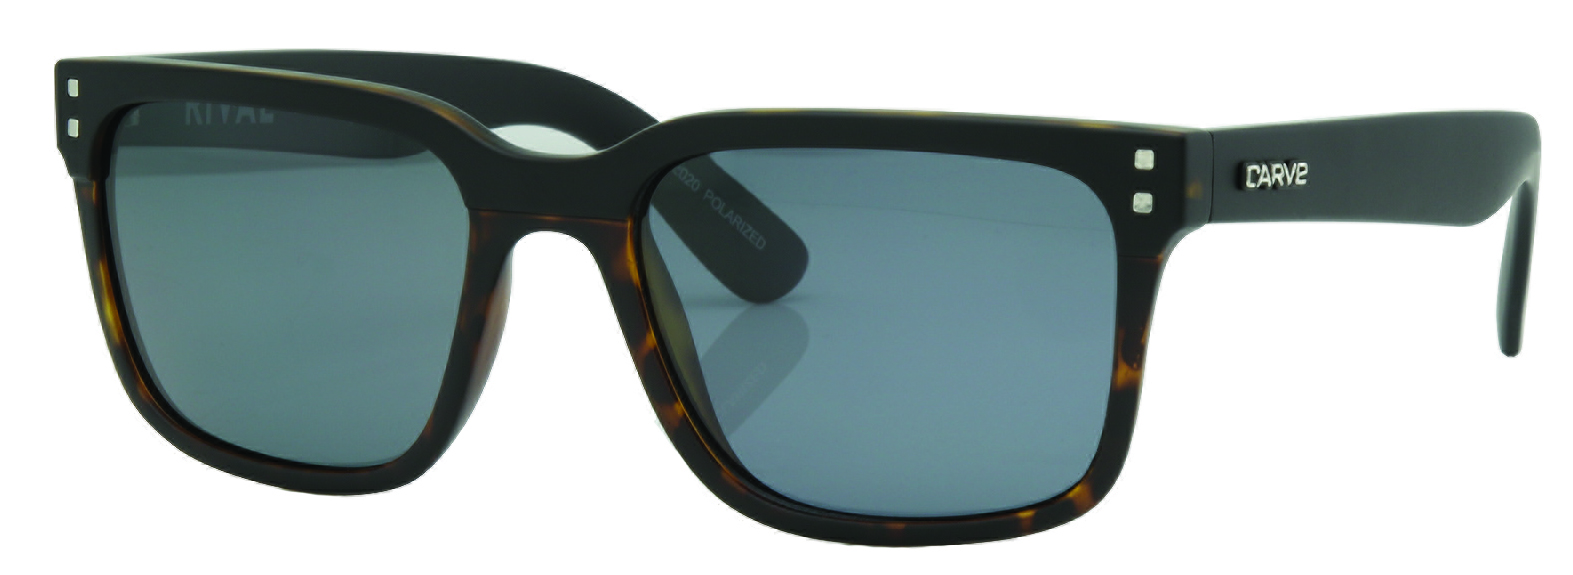 760fbb8833 Carve Sunglasses SS18 Preview - Boardsport SOURCE